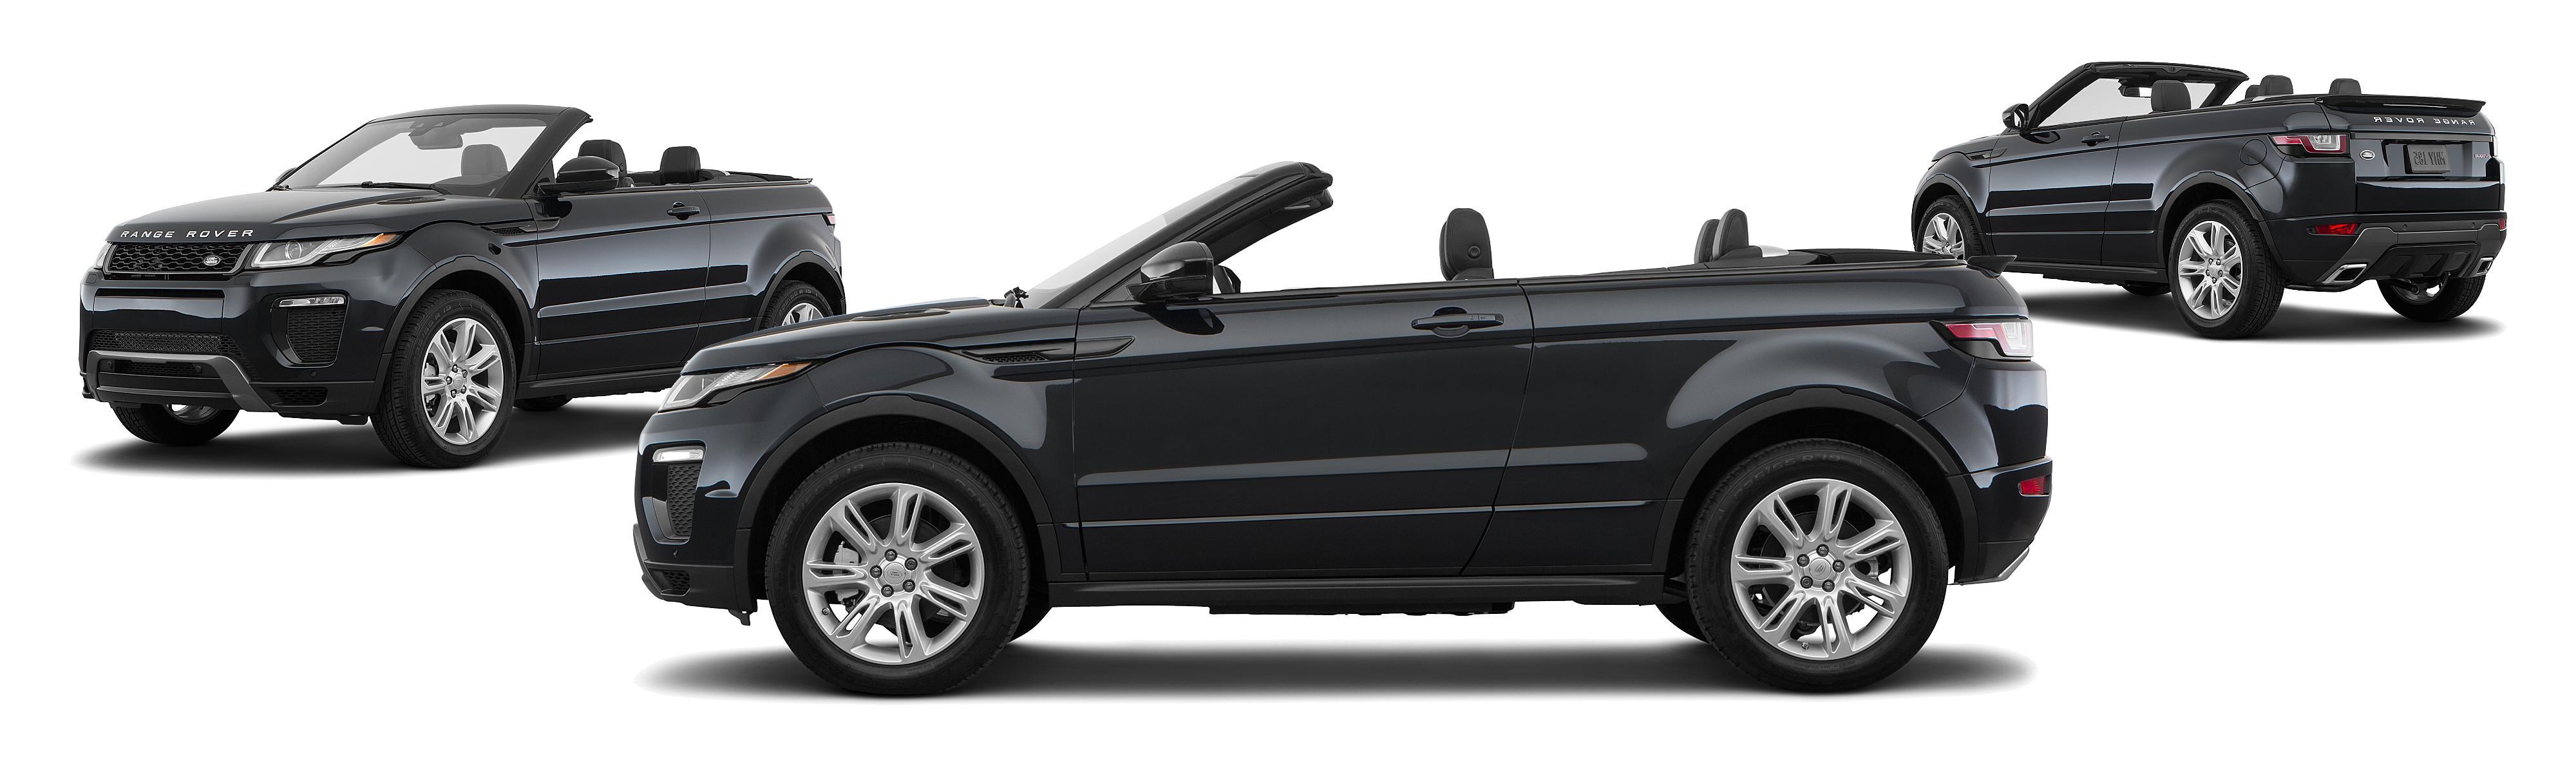 2017 Land Rover Range Rover Evoque Convertible AWD HSE Dynamic 2dr